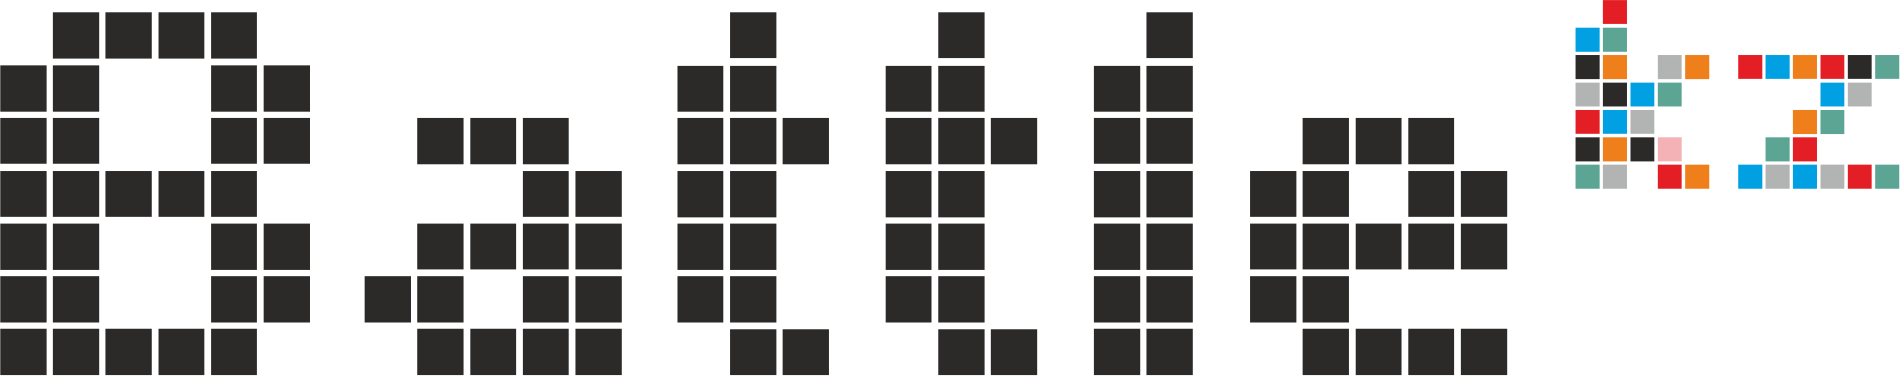 Battle.kz — Киберспортивный портал